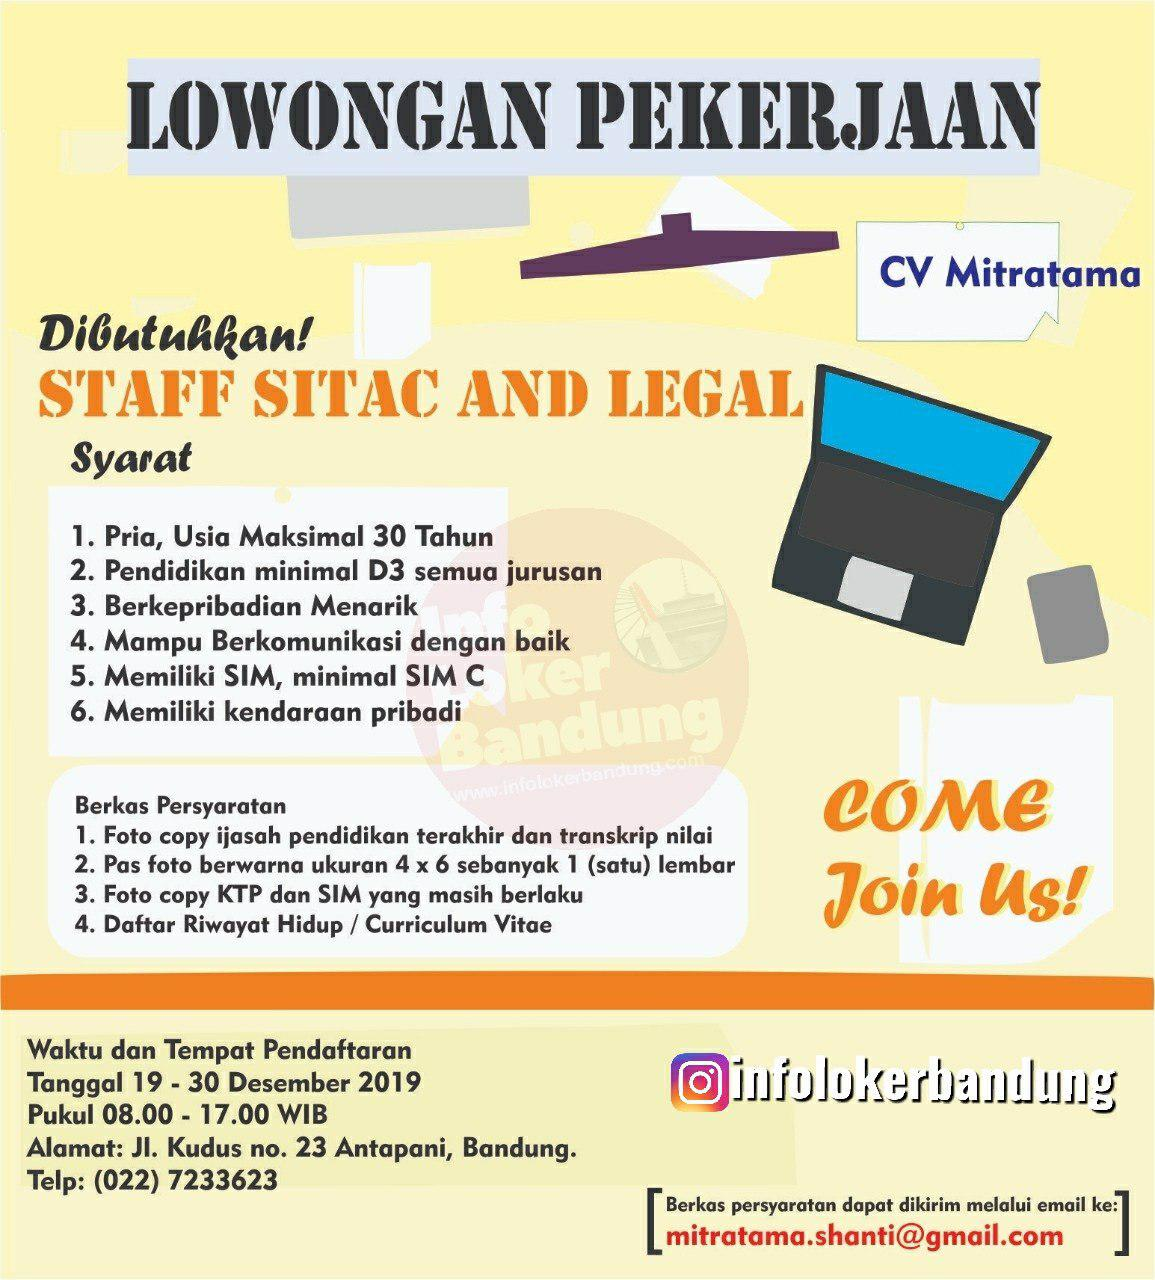 Lowongan Kerja Staff Sitac & Legal CV. Mitratama Bandung Desember 2019